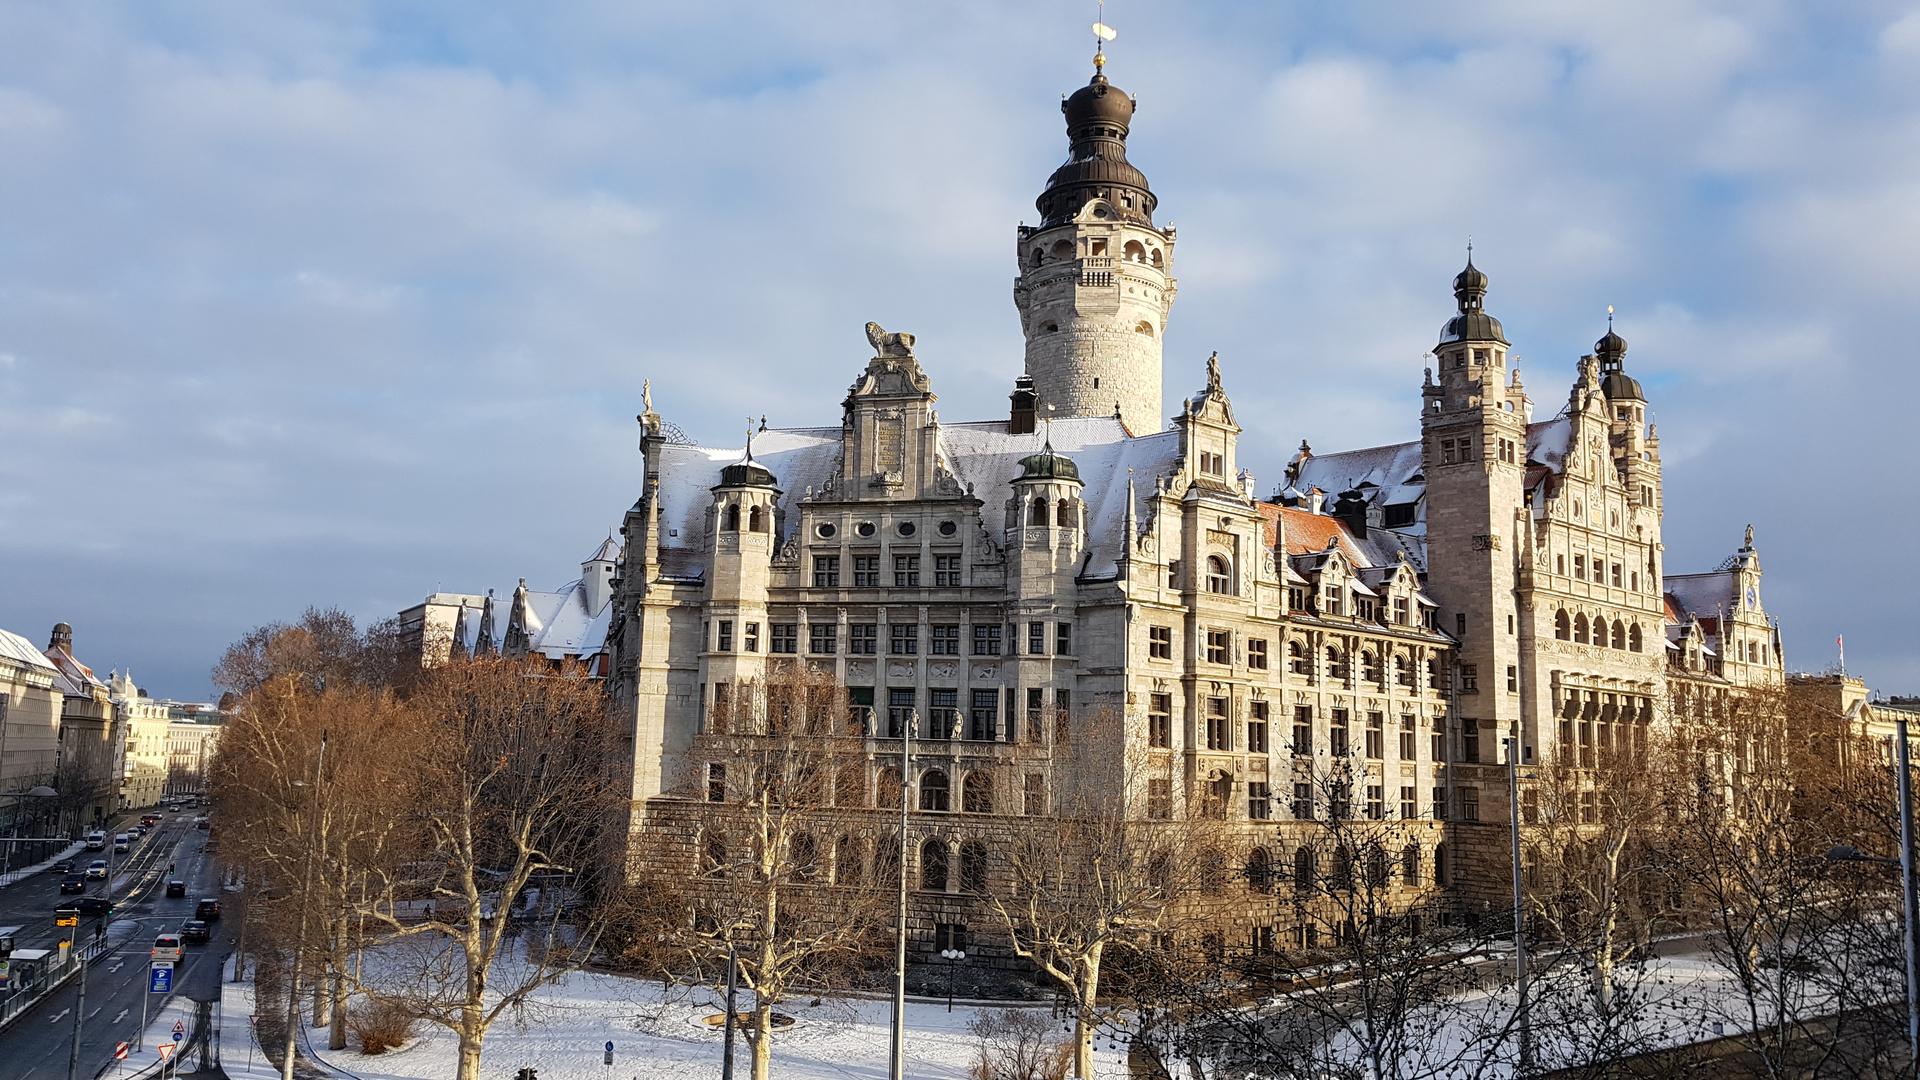 29.01.2019 Neues Rathaus